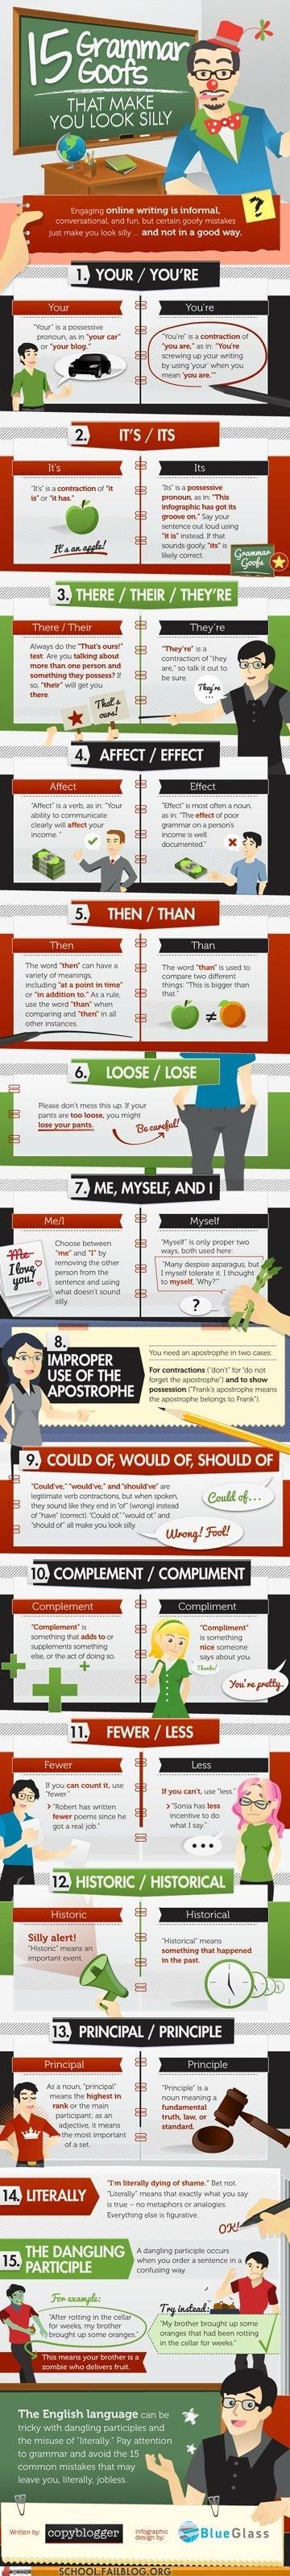 School of Fail: English 101: Listen Up, Internet.